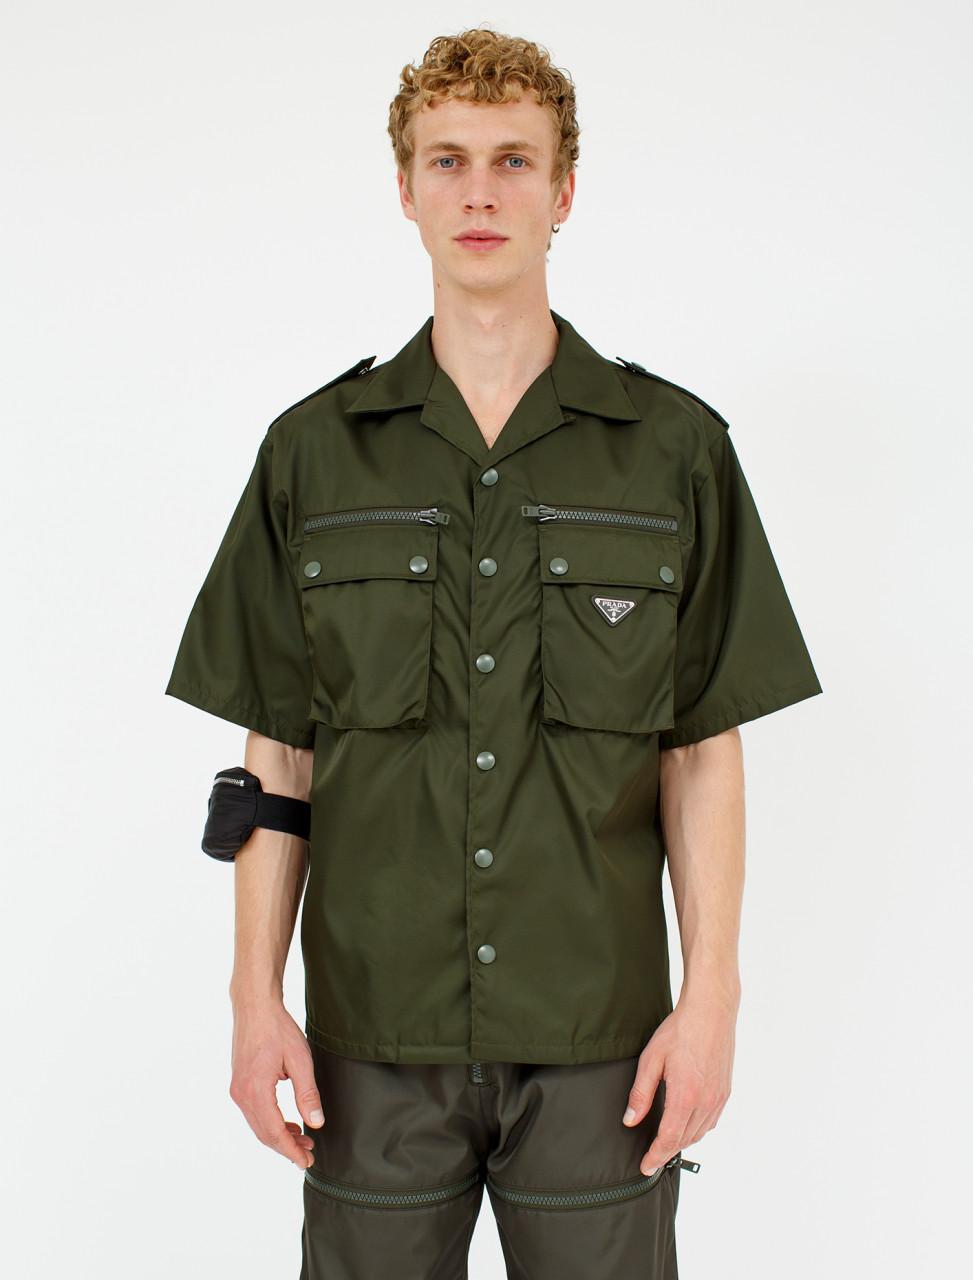 Nylon Gabardine Shirt with Epaulettes